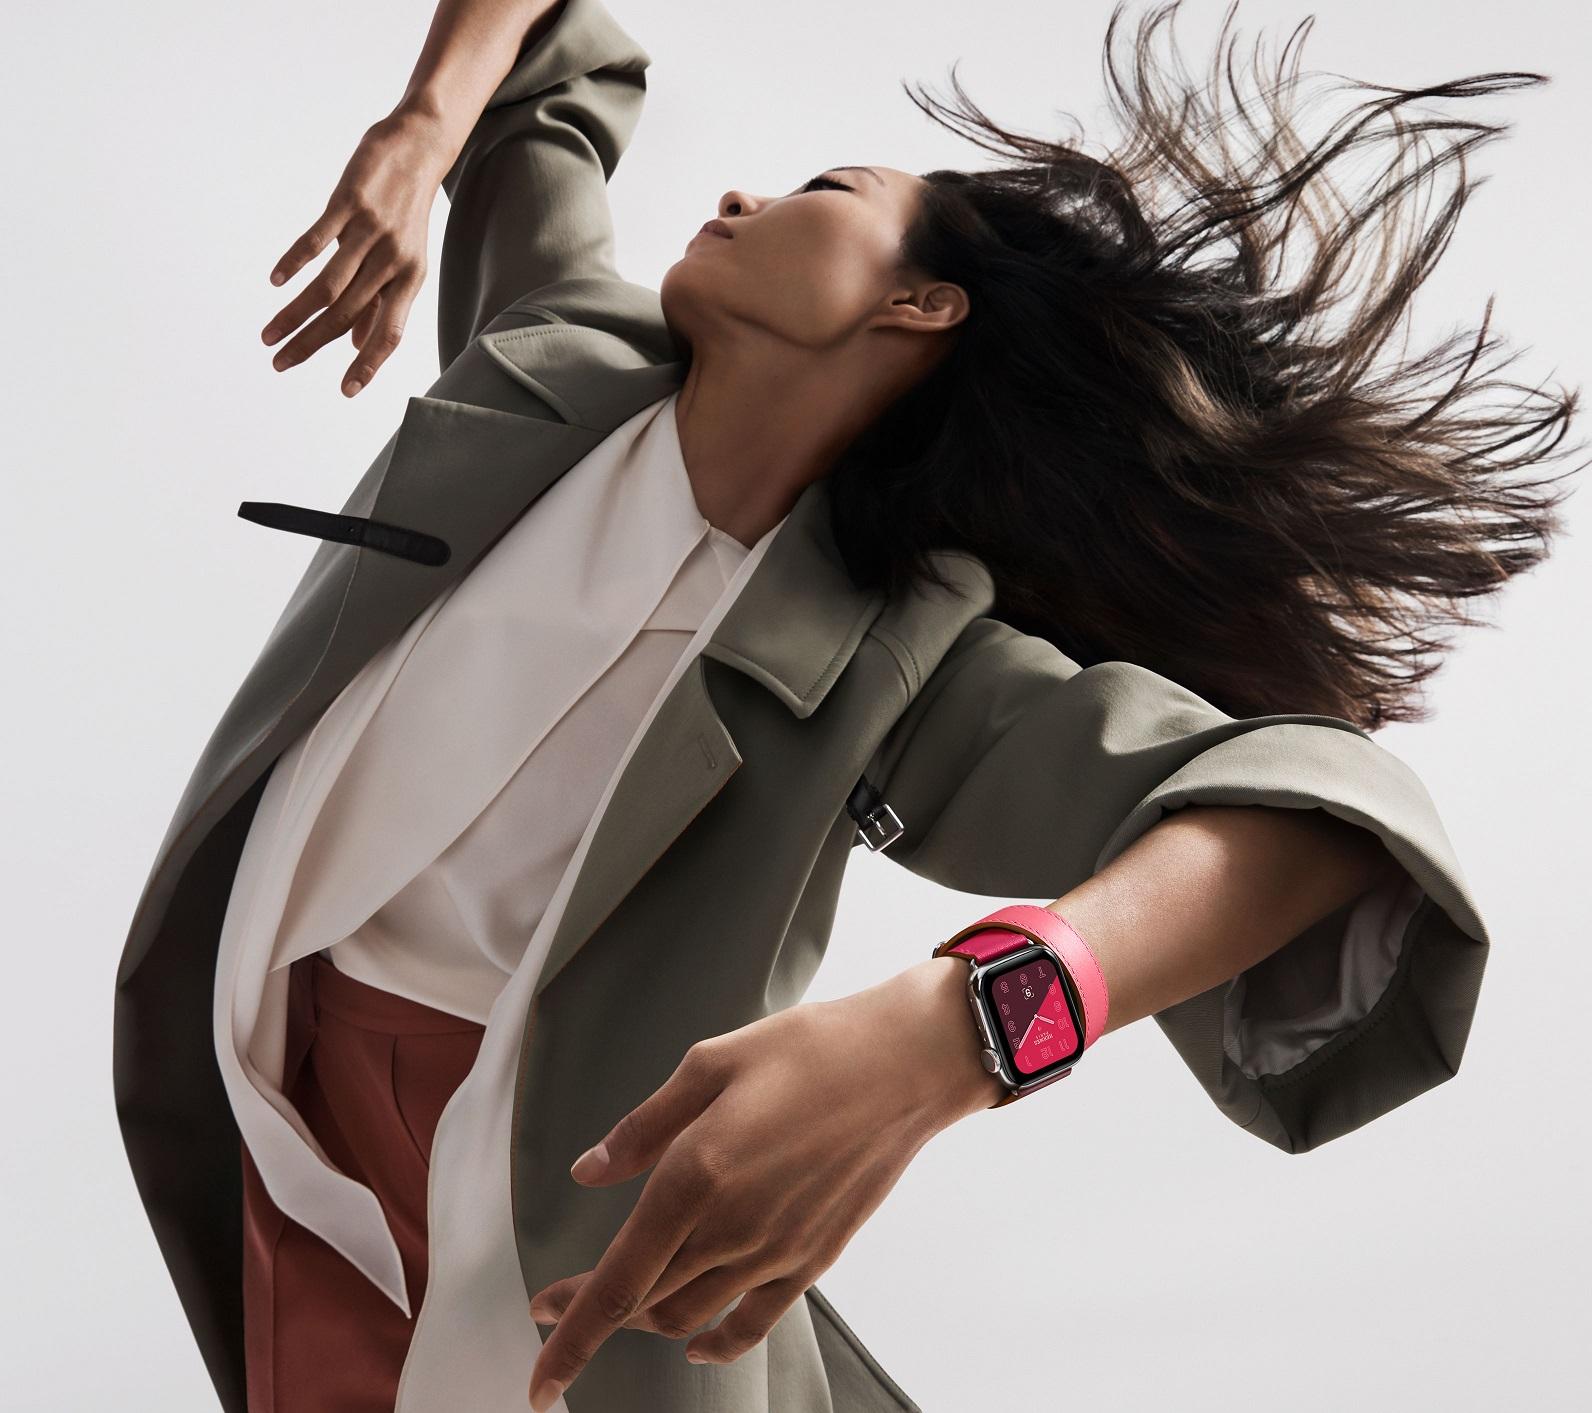 Apple Watch Hermès with Rose Extreme, Rose Azalee, Bordeaux Double Tour, 1399$